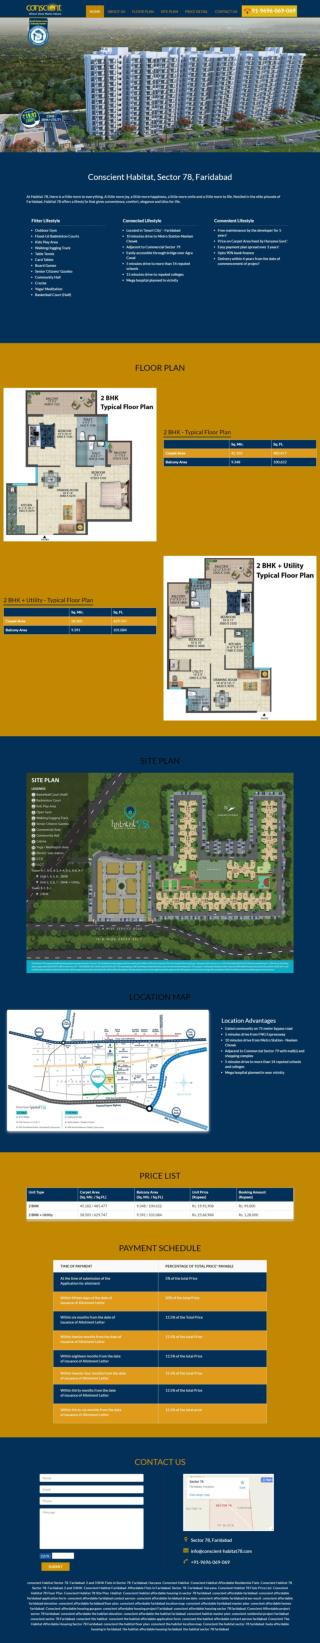 Conscient Habitat Sector 78 Faridabad